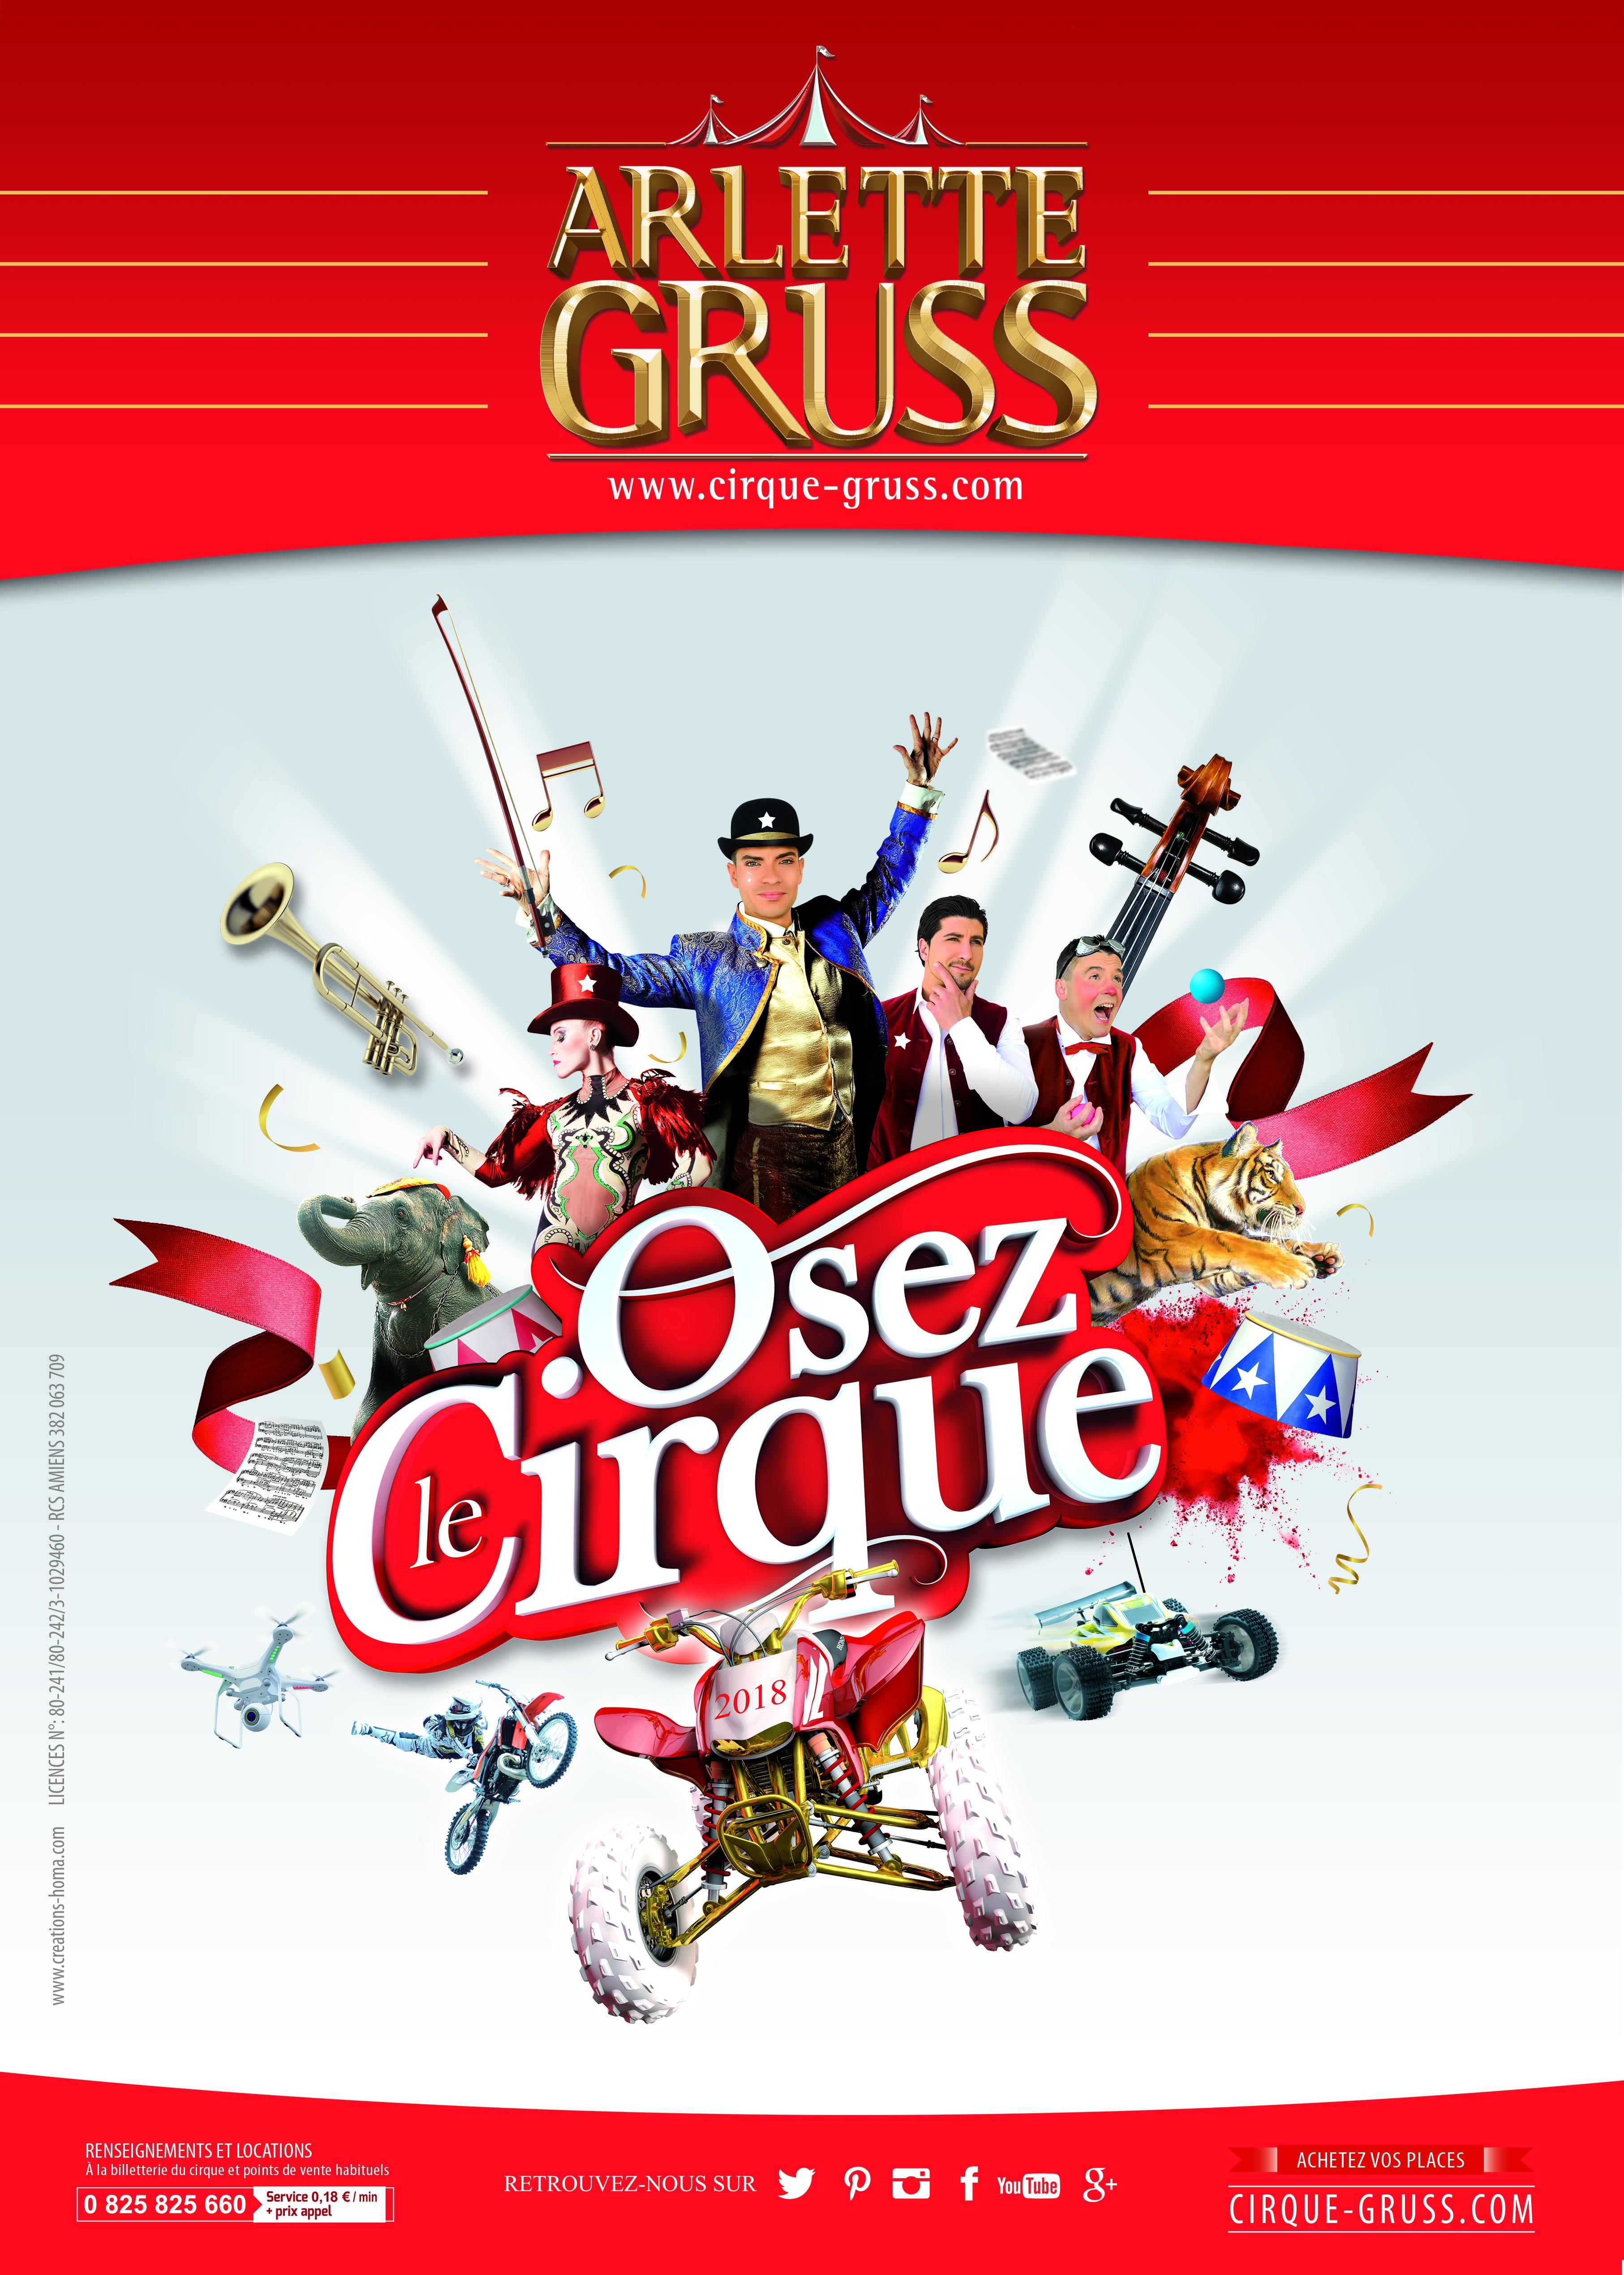 CIRQUE ARLETTE GRUSS GASSIN